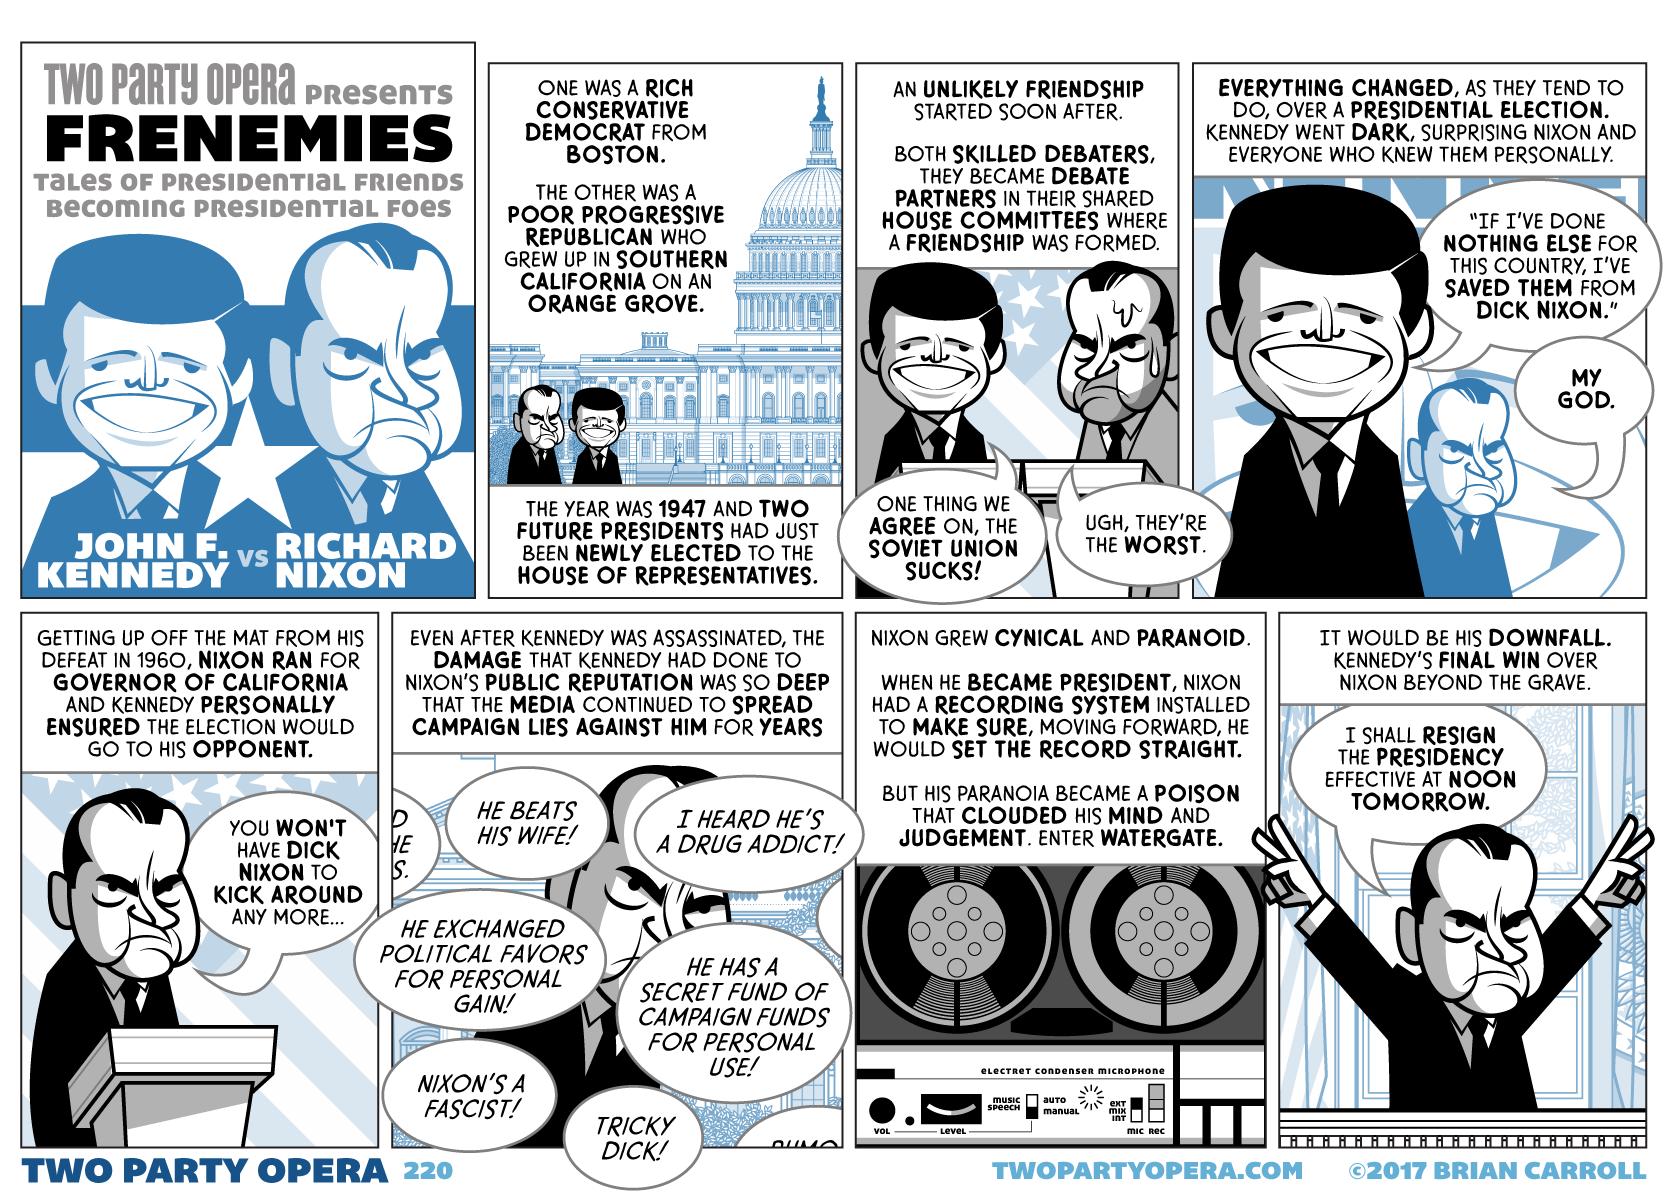 Frenemies – John F Kennedy VS Richard Nixon